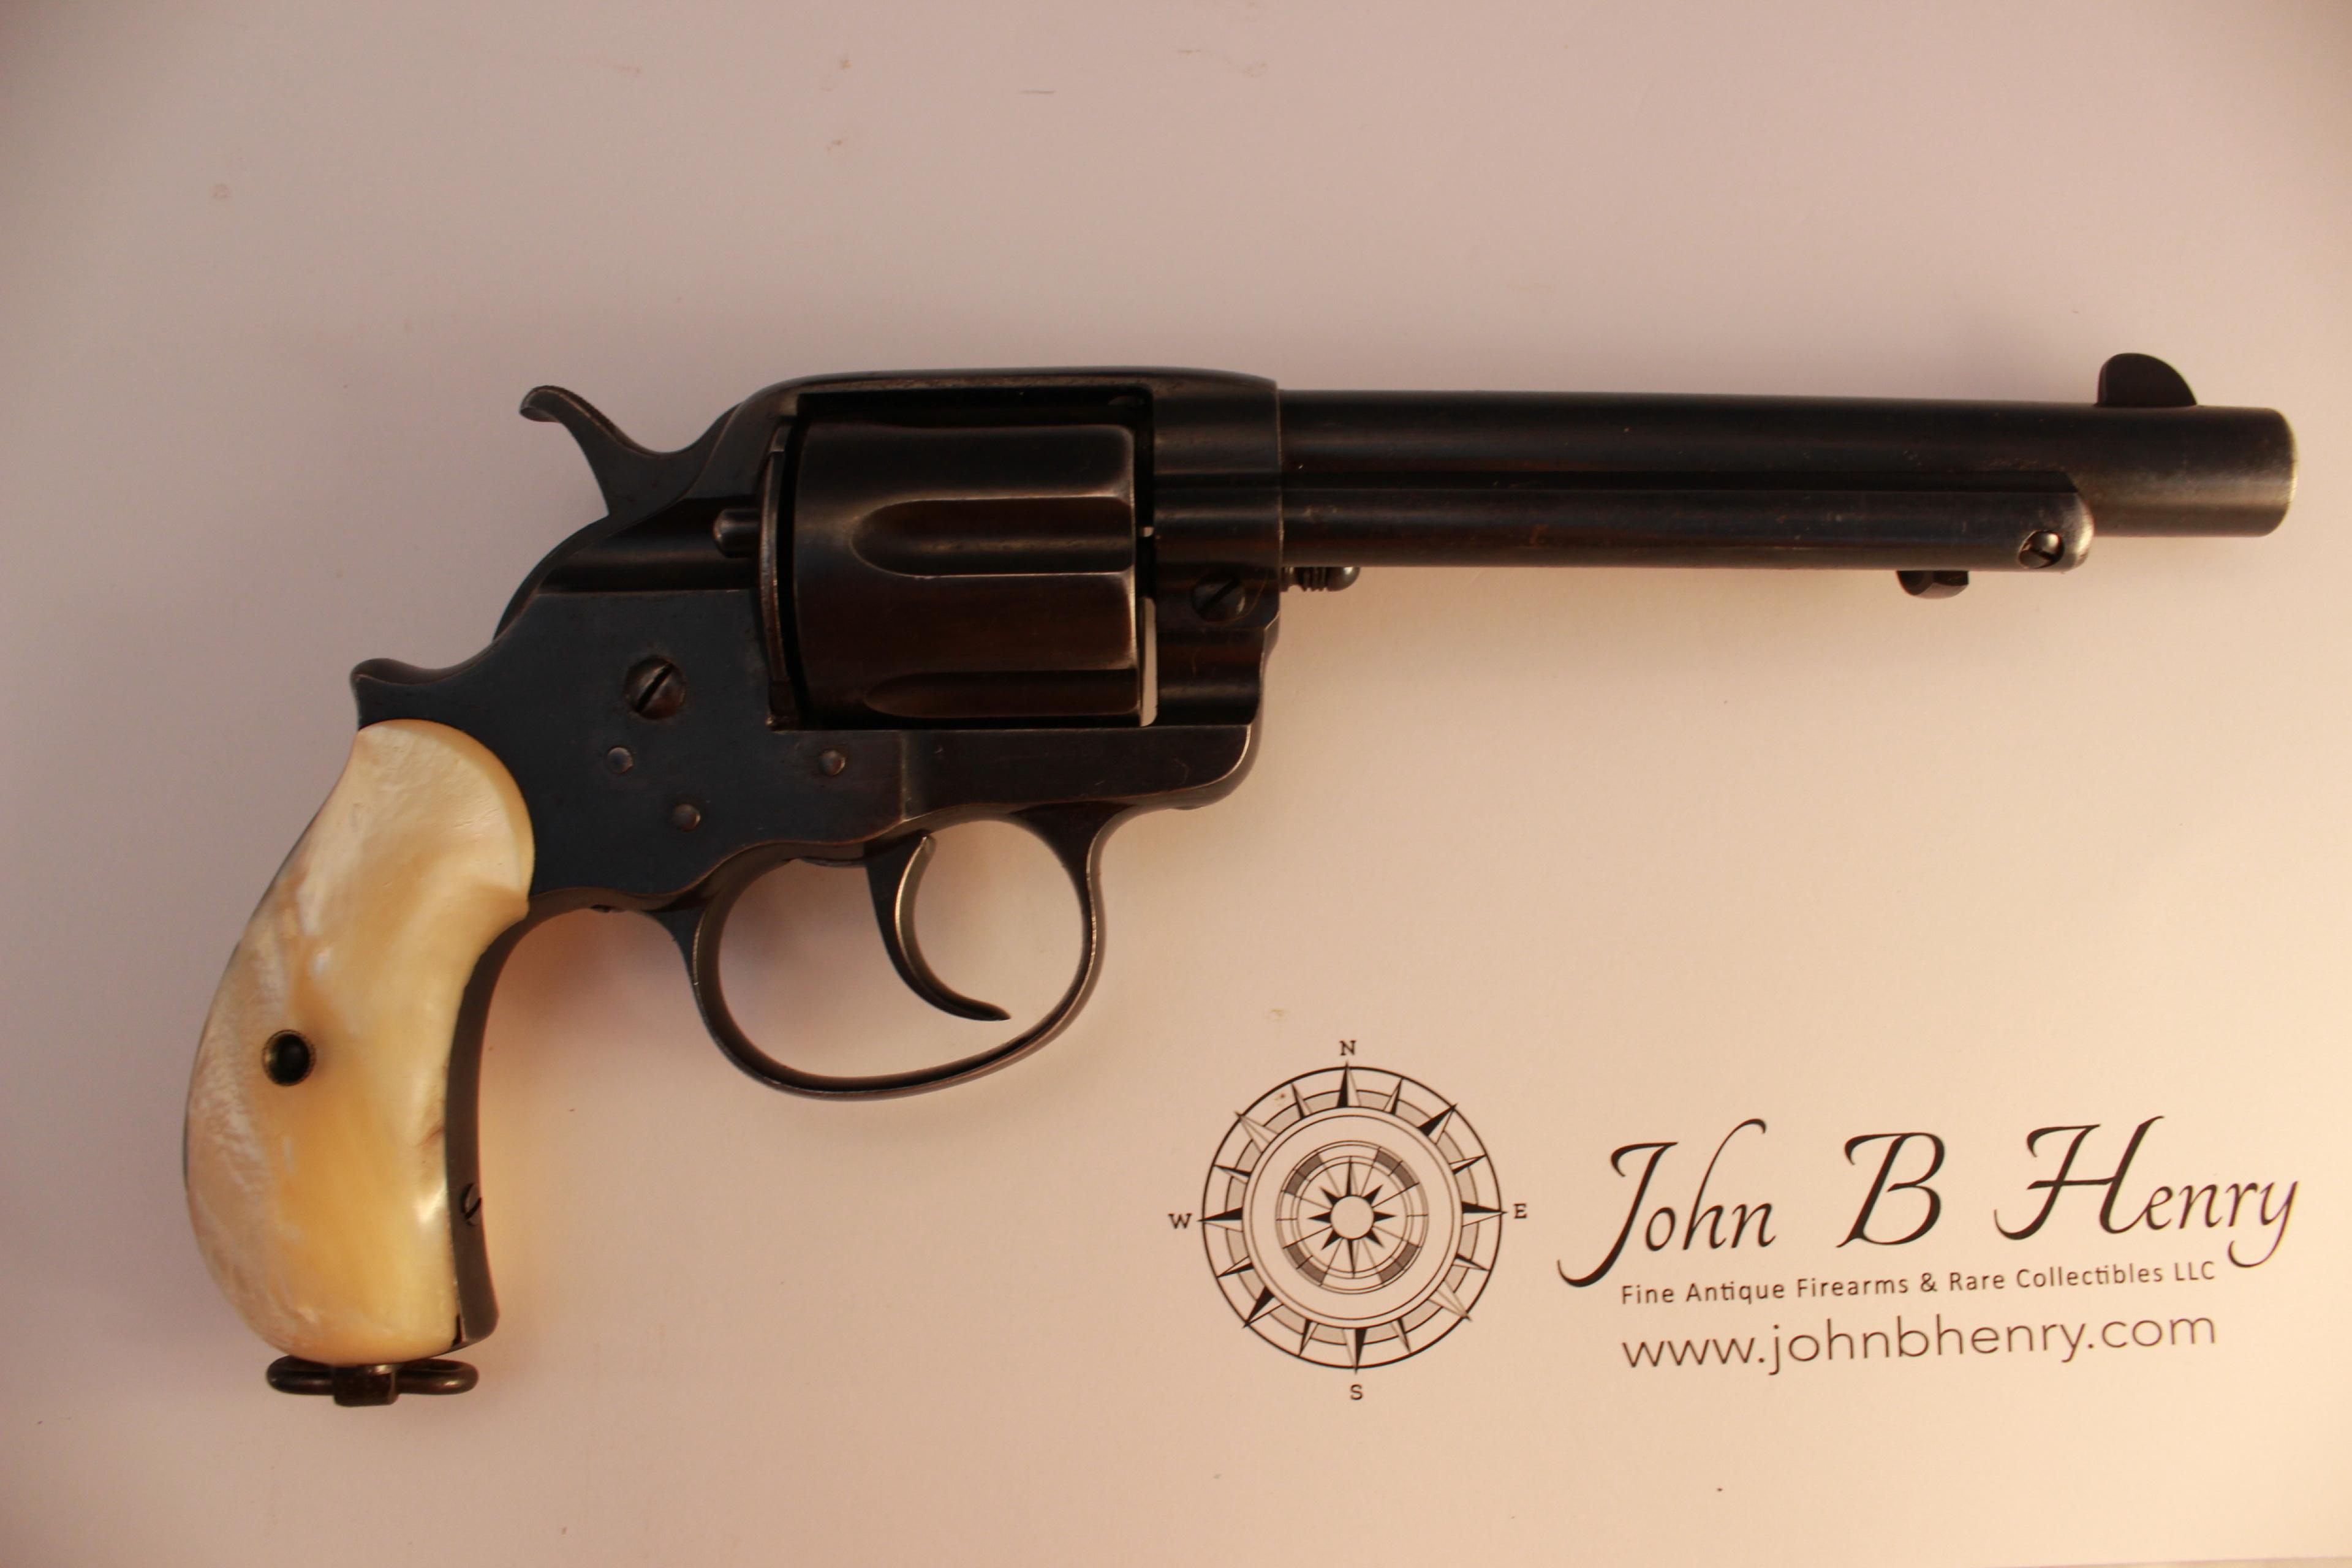 gambler u2019s case with colt model 1878 frontier double action revolver d1153